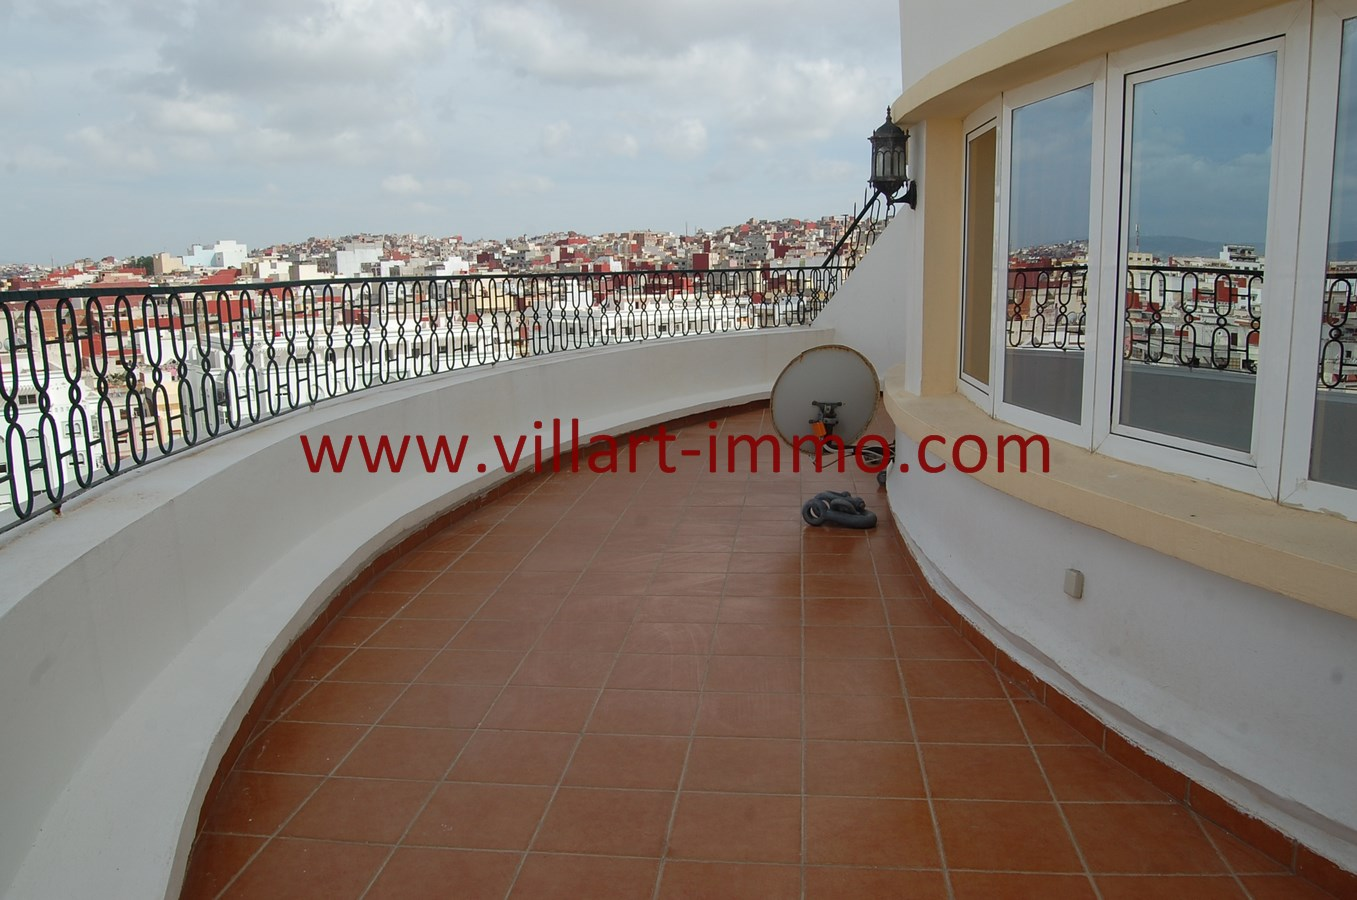 5-Vente-Appartement-Tanger-Route de Rabat-Terrasse 1-VA494-Villart Immo